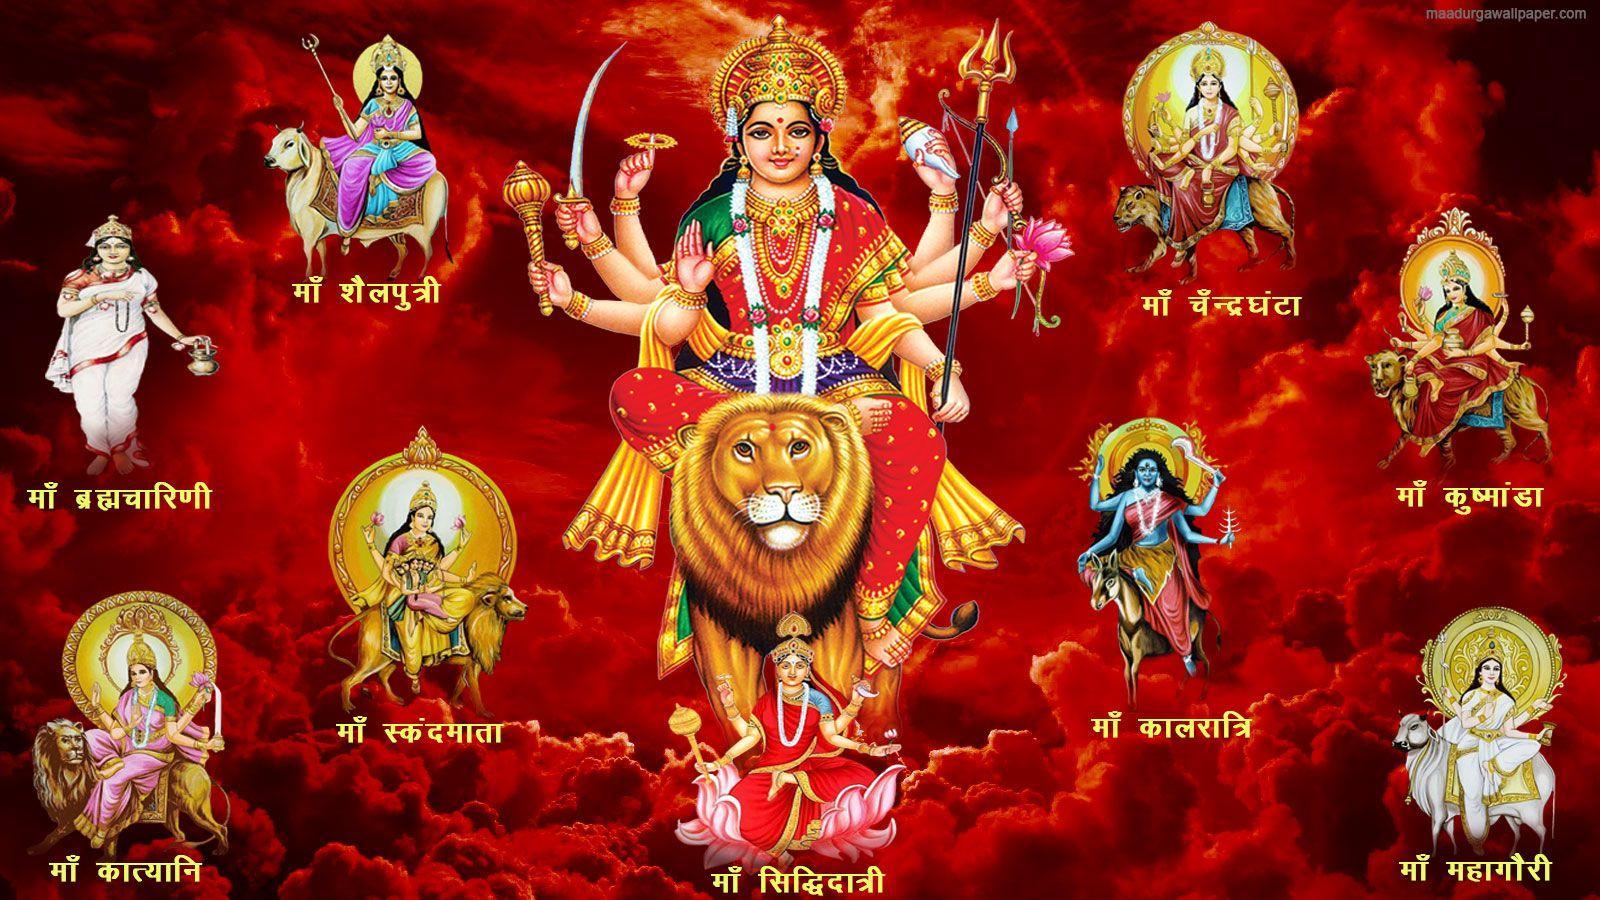 Goddess Durga Wallpapers Top Free Goddess Durga Backgrounds Wallpaperaccess